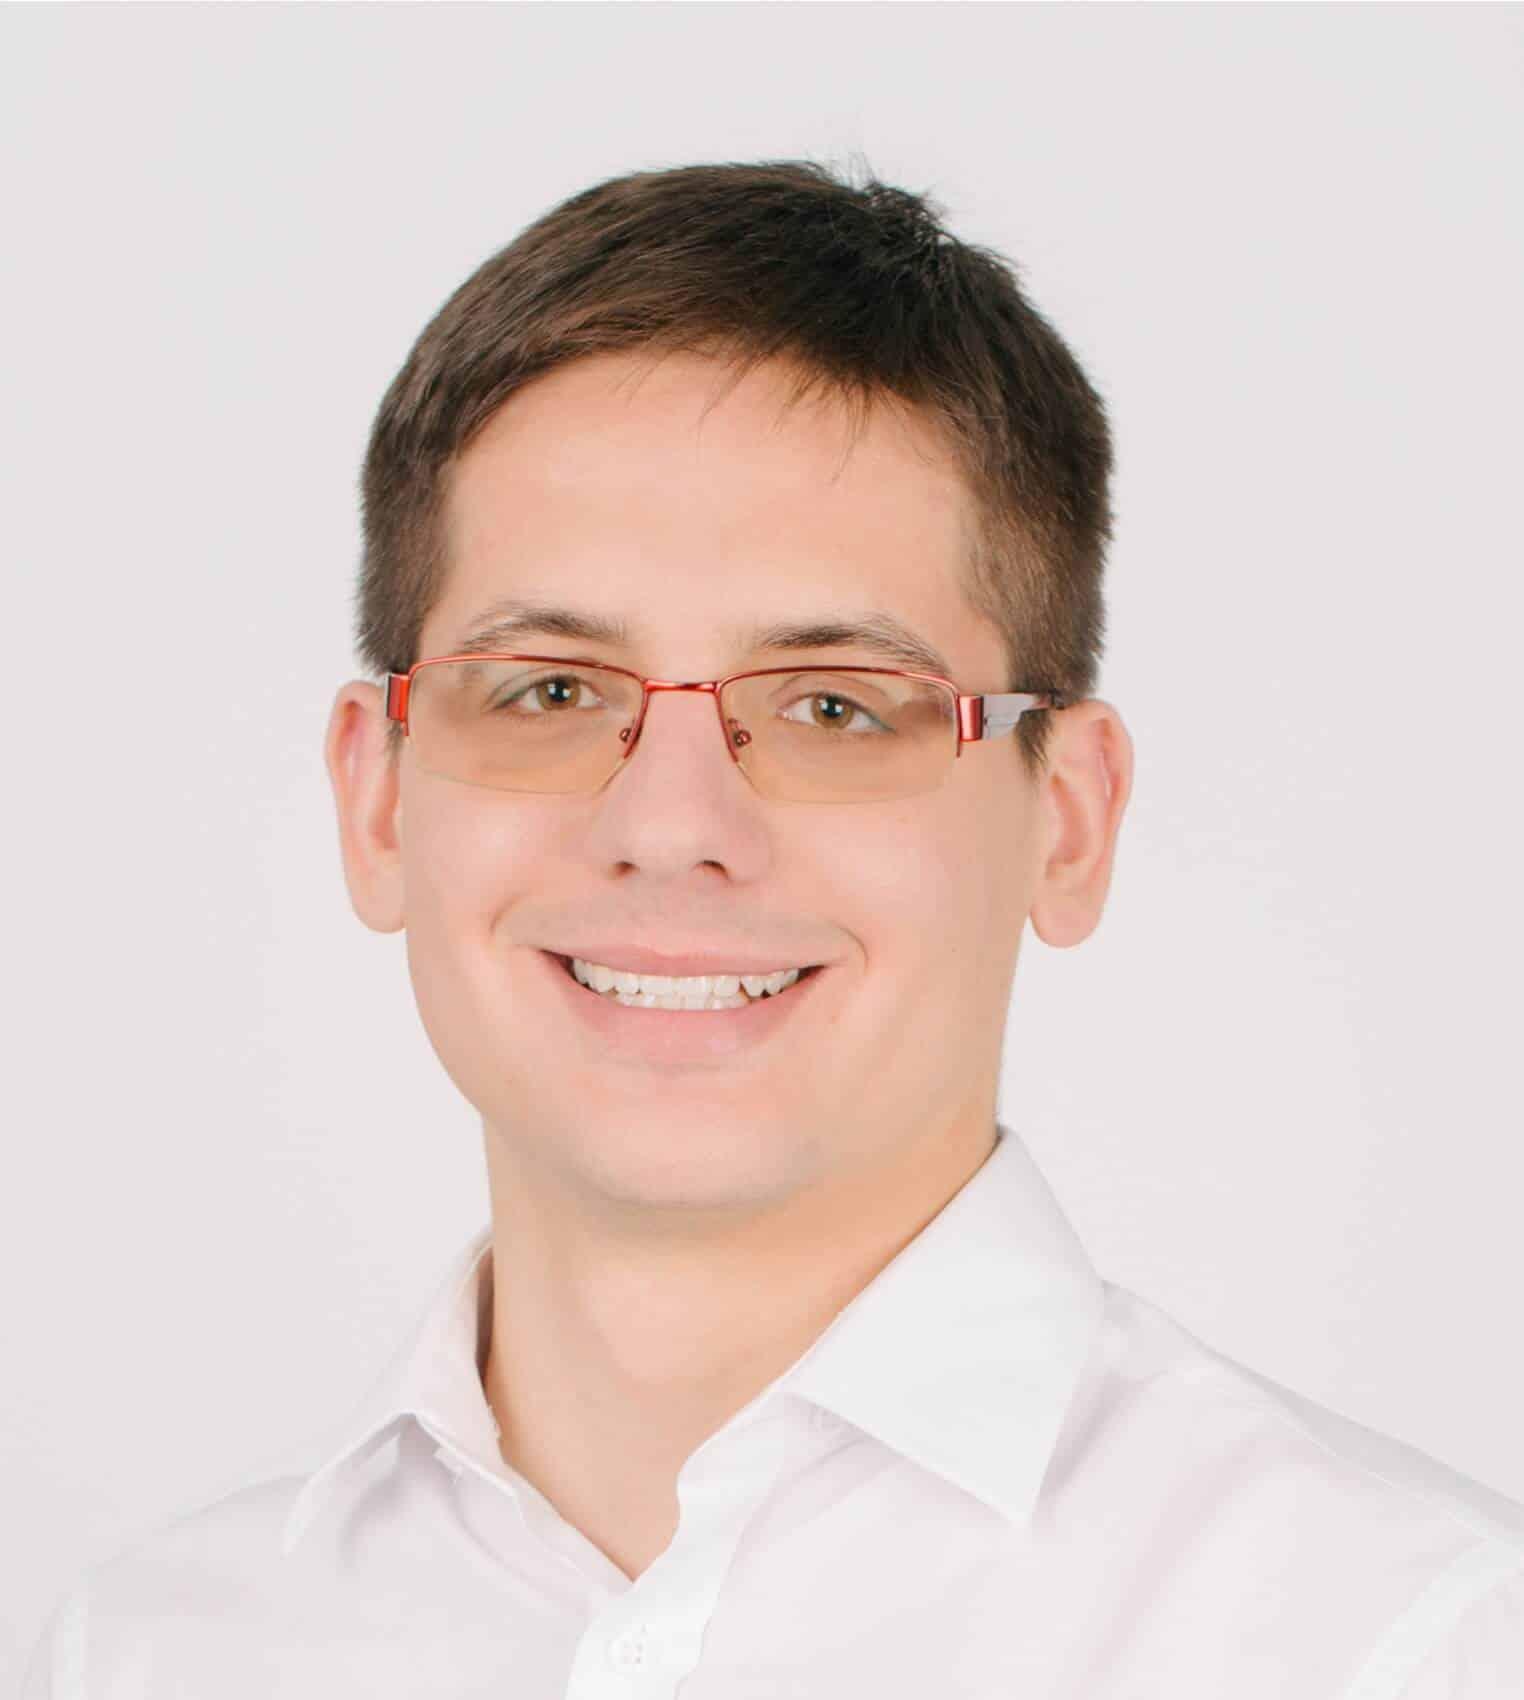 Piotr Bieliński